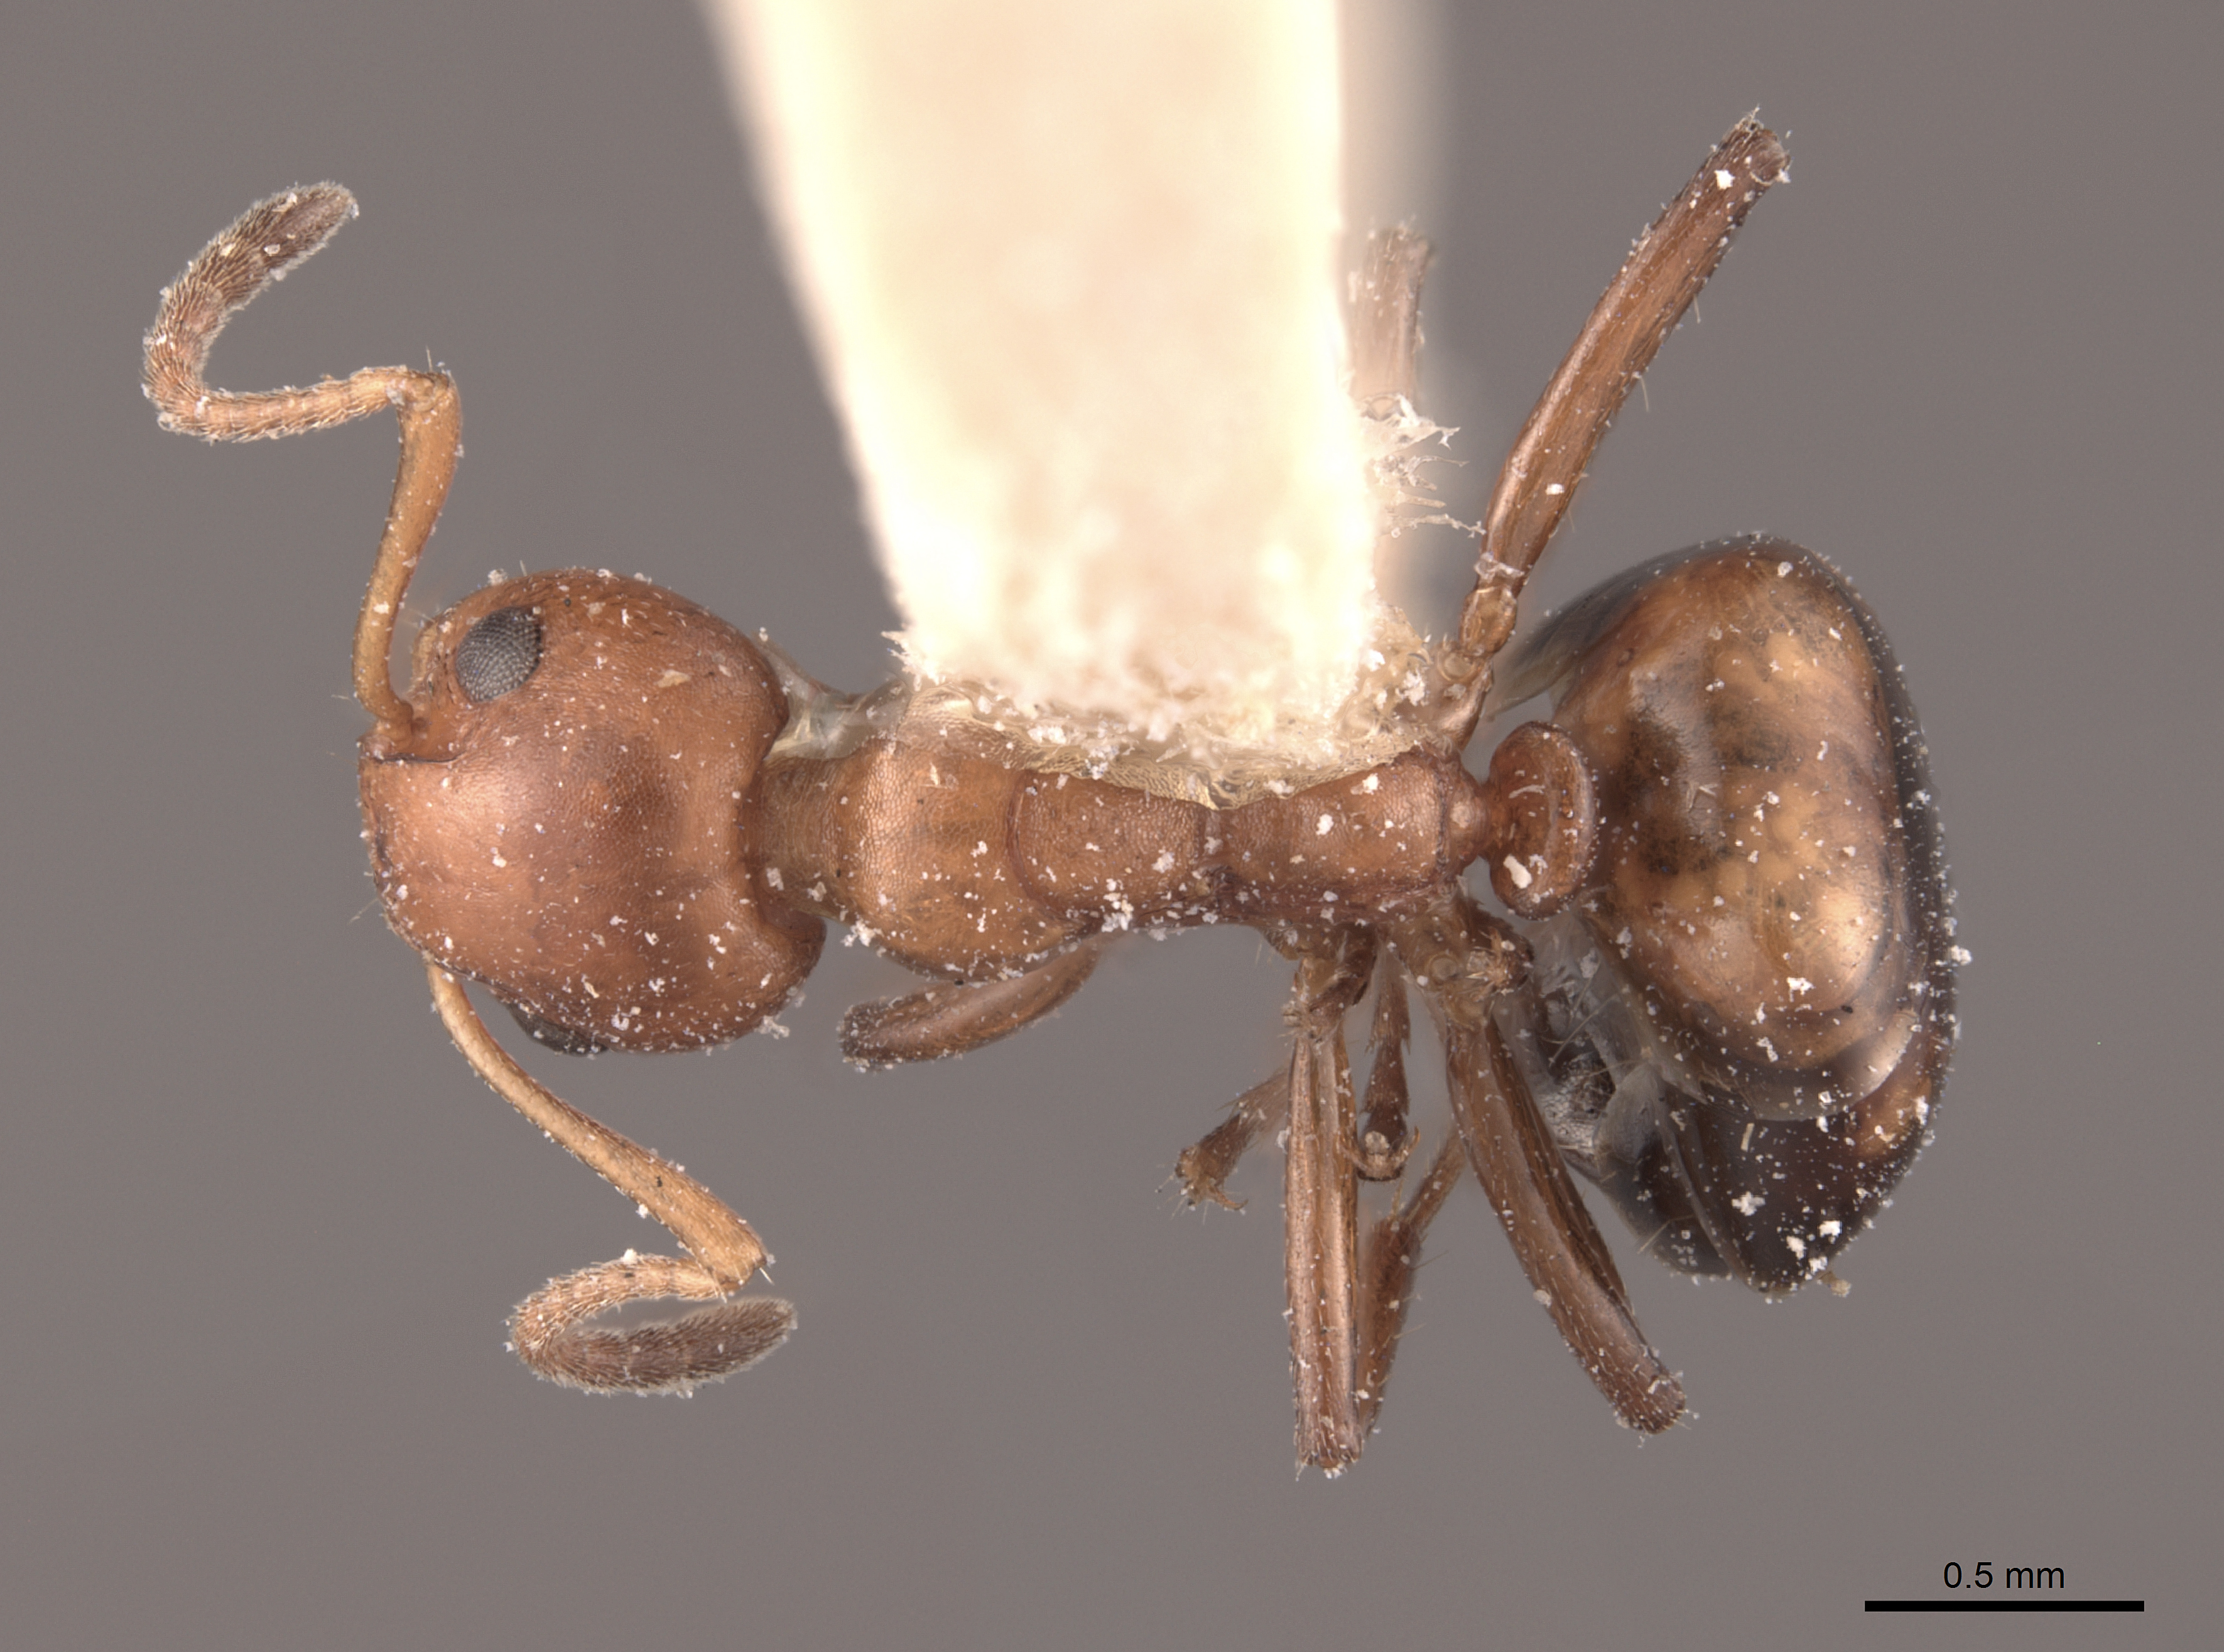 Image of Dolichoderus mariae